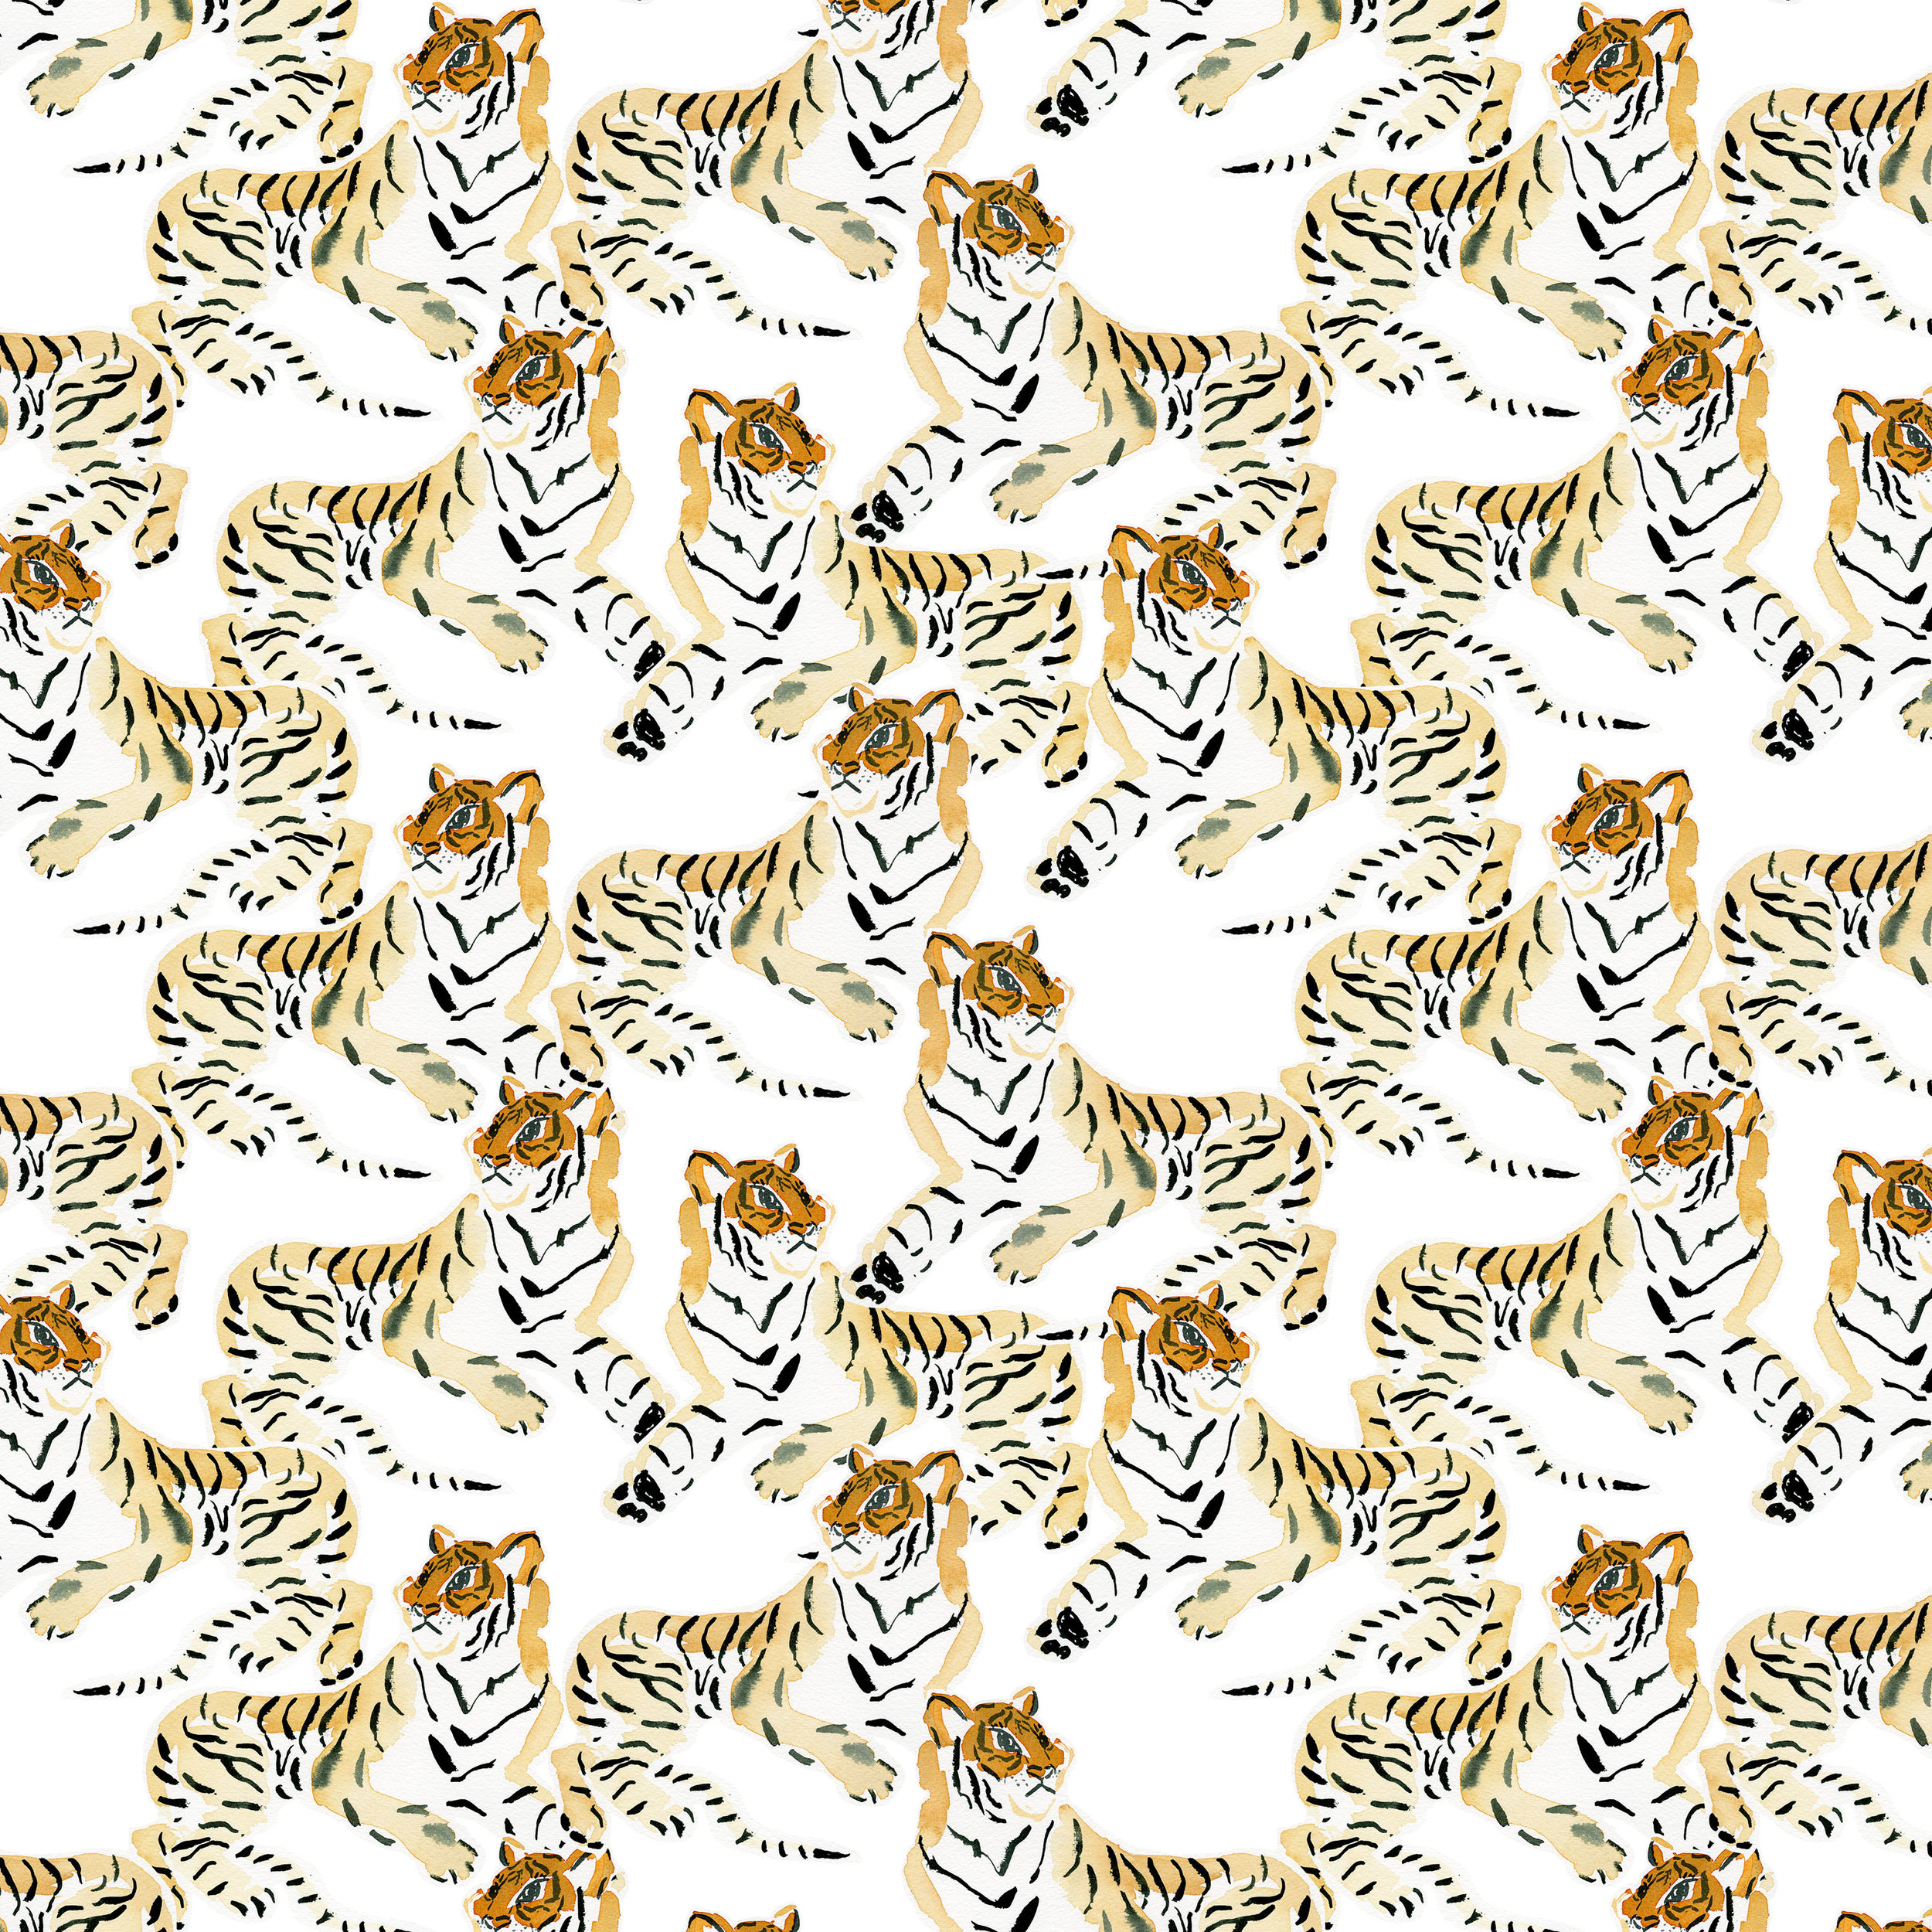 white tigers repeat_150.jpg